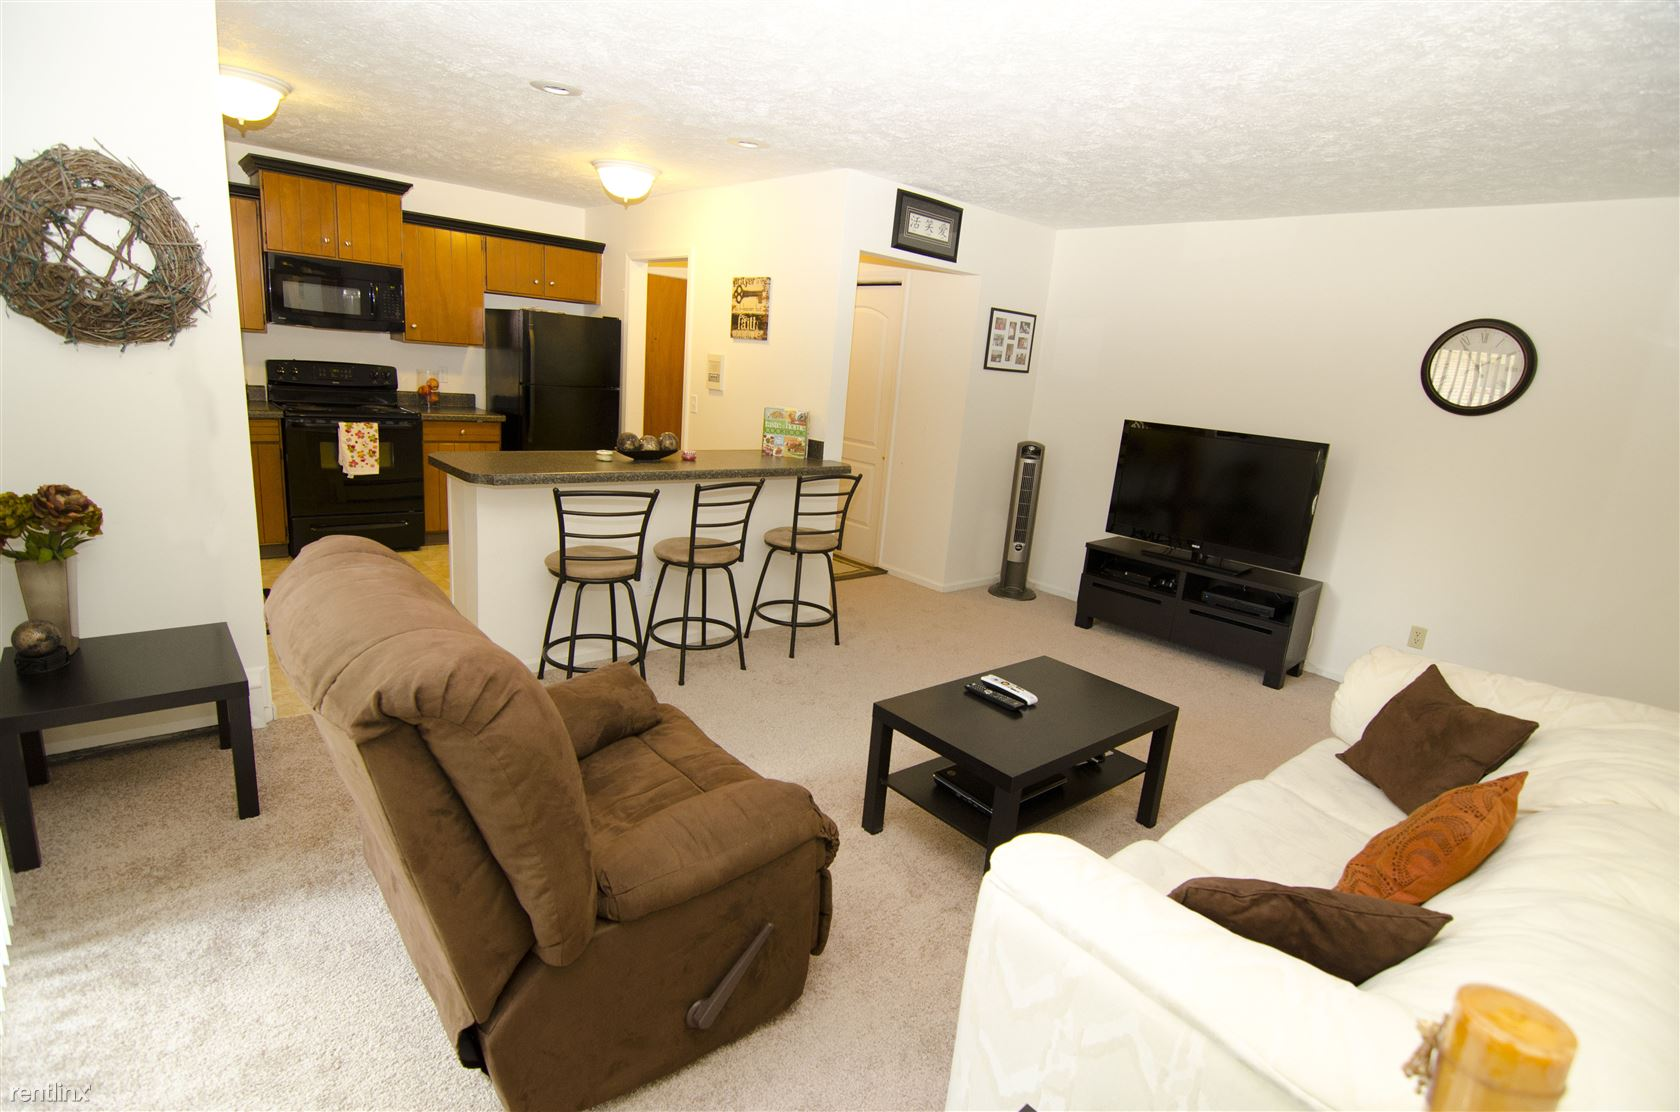 208 W Saginaw St, East Lansing, MI - $720